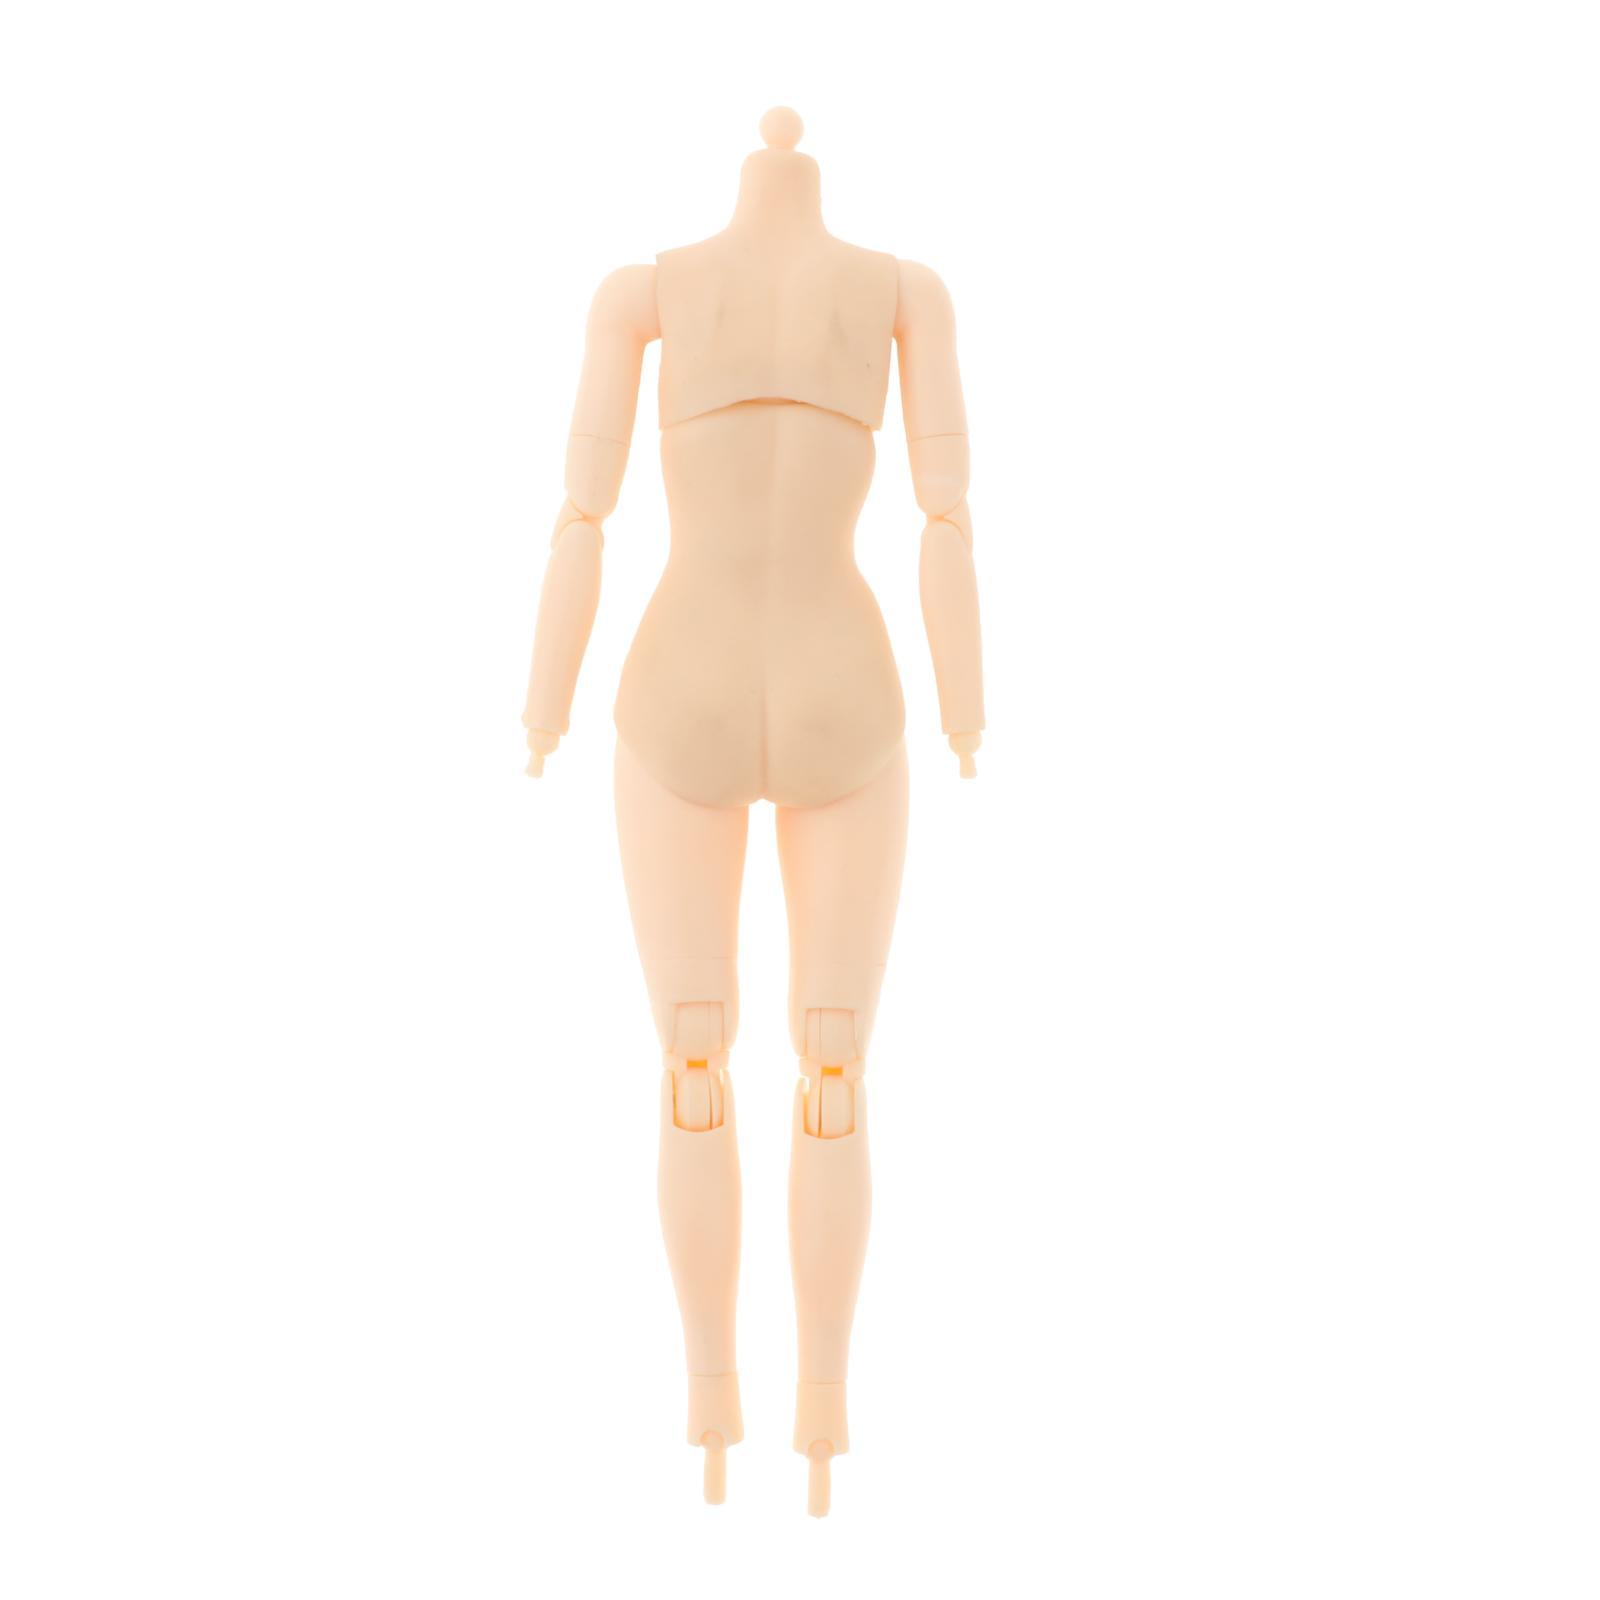 miniature 29 - 1/6 Scale Female Flexible Body 12 Inches Action Figure Body Seamless Figure